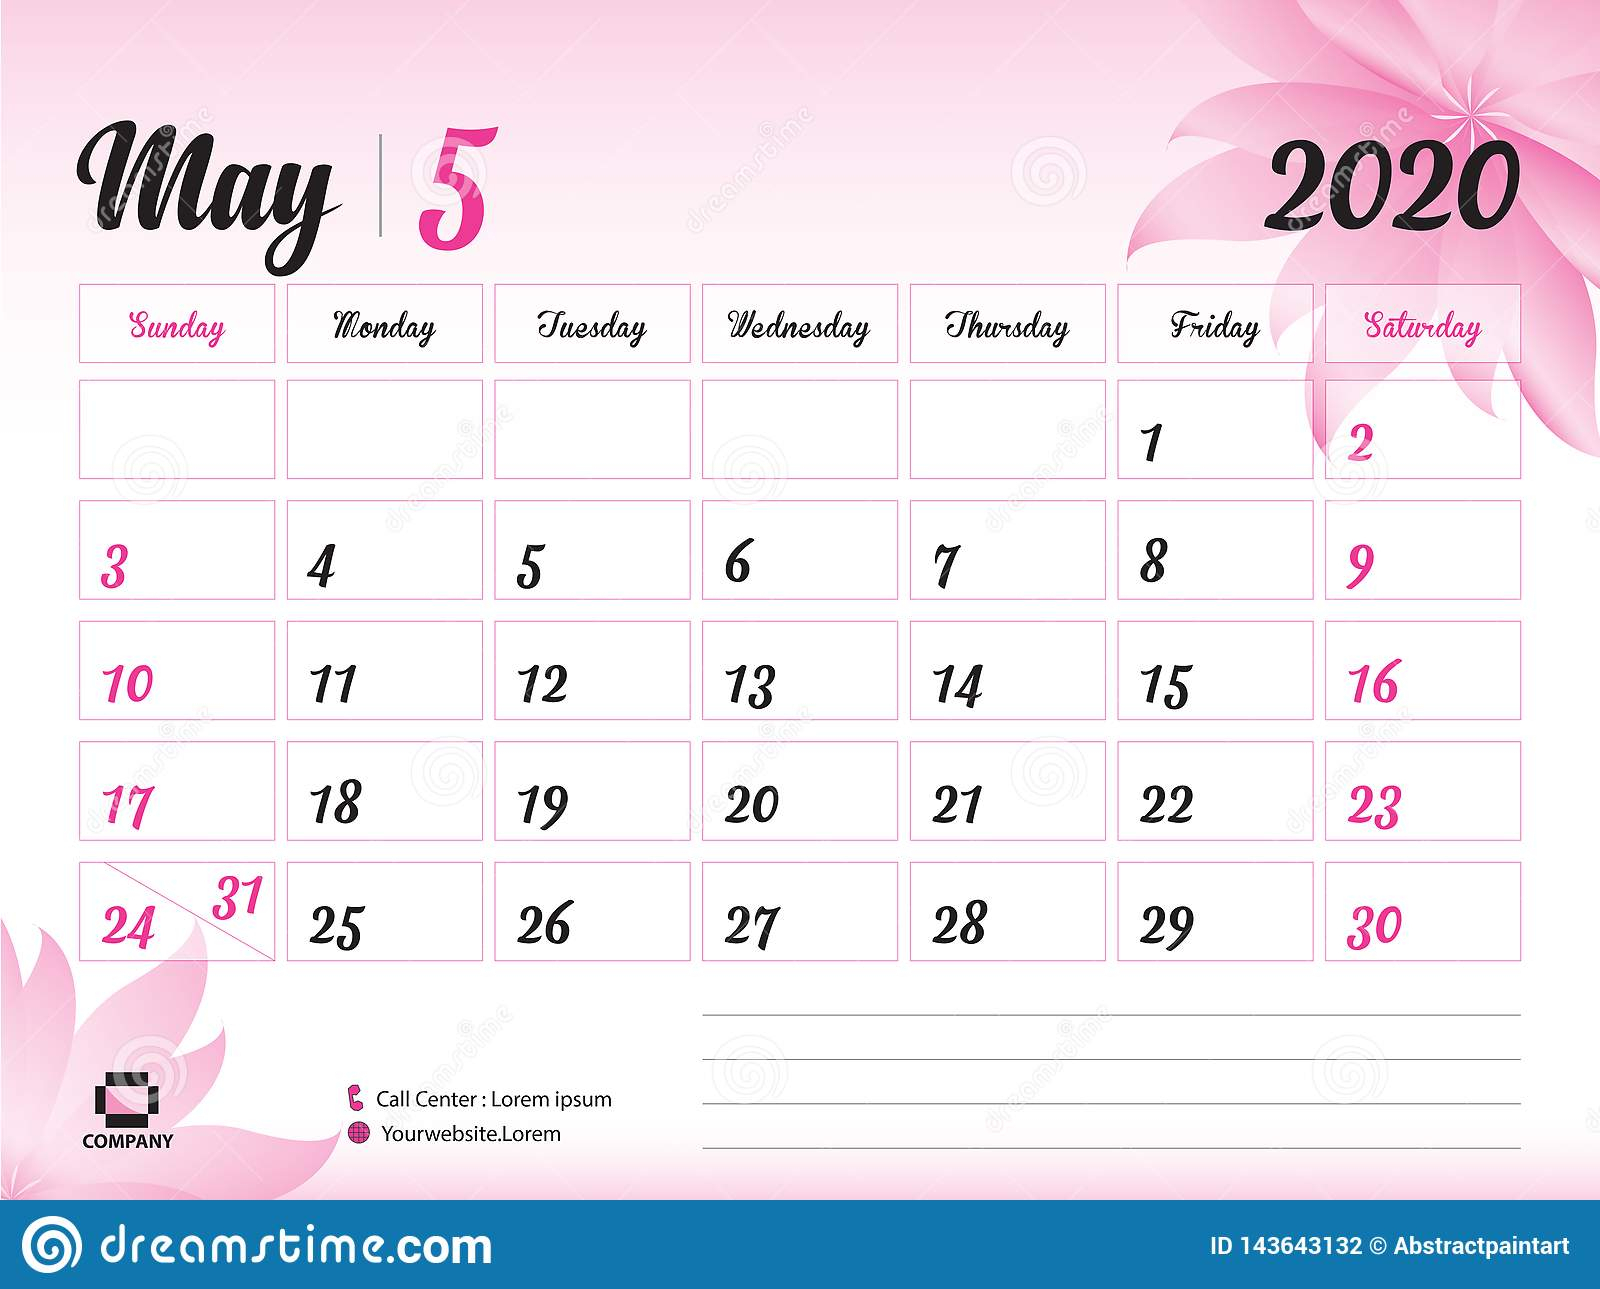 May 2020 Year Template, Calendar 2020 Vector, Desk Calendar